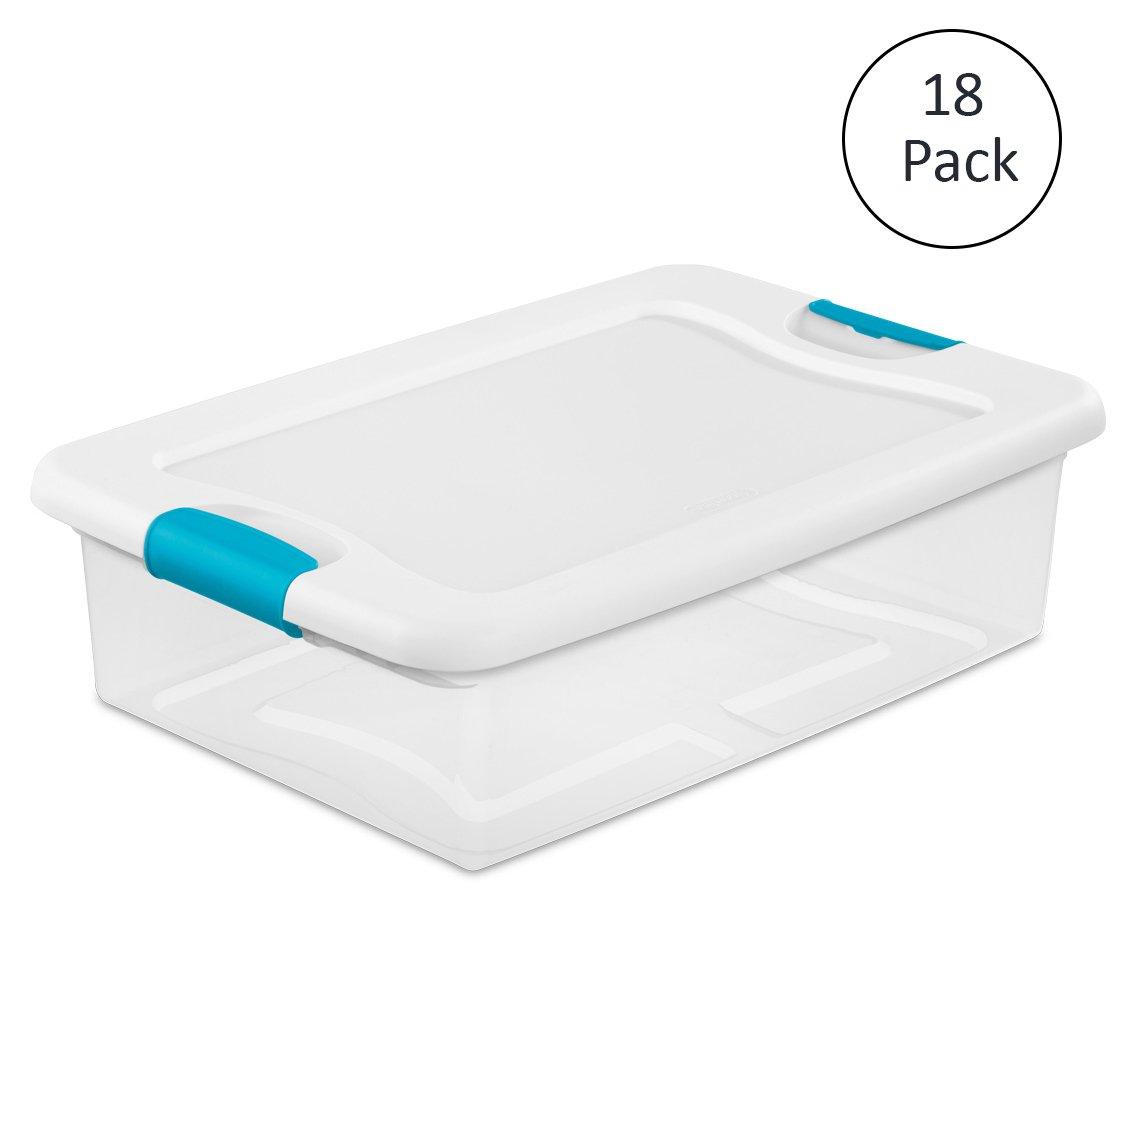 Sterilite 1496 32-Quart Clear Latching Stacking Storage Box, 18 Pack